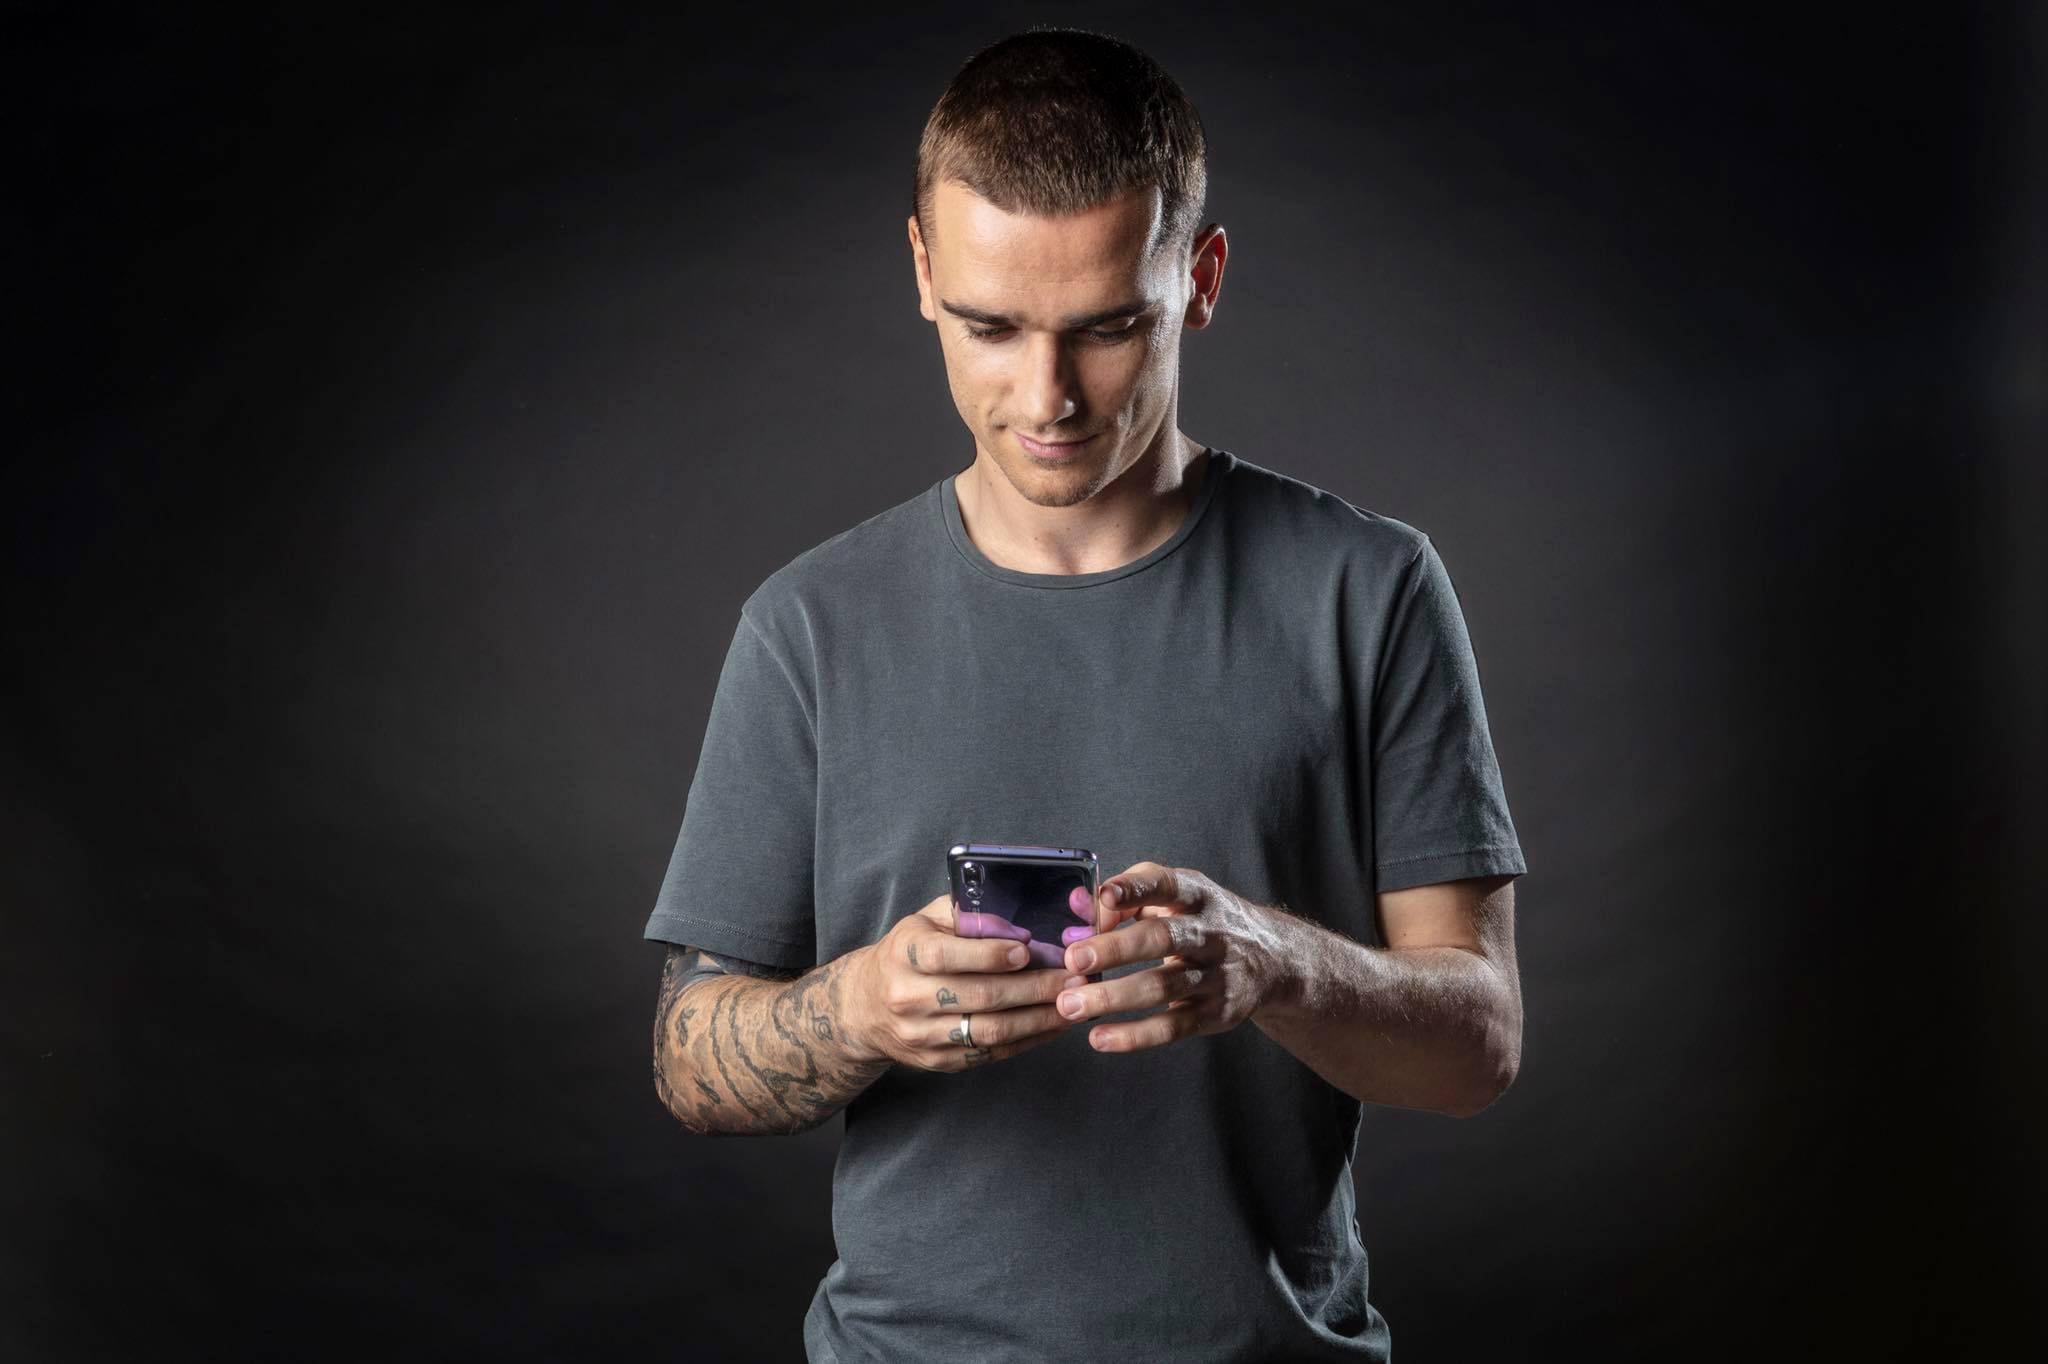 Antoine Griezmann Sponsors Brand Endorsements Brand Ambassador Personal Sponsorship deals list french footballer Huawei mobile smart phones